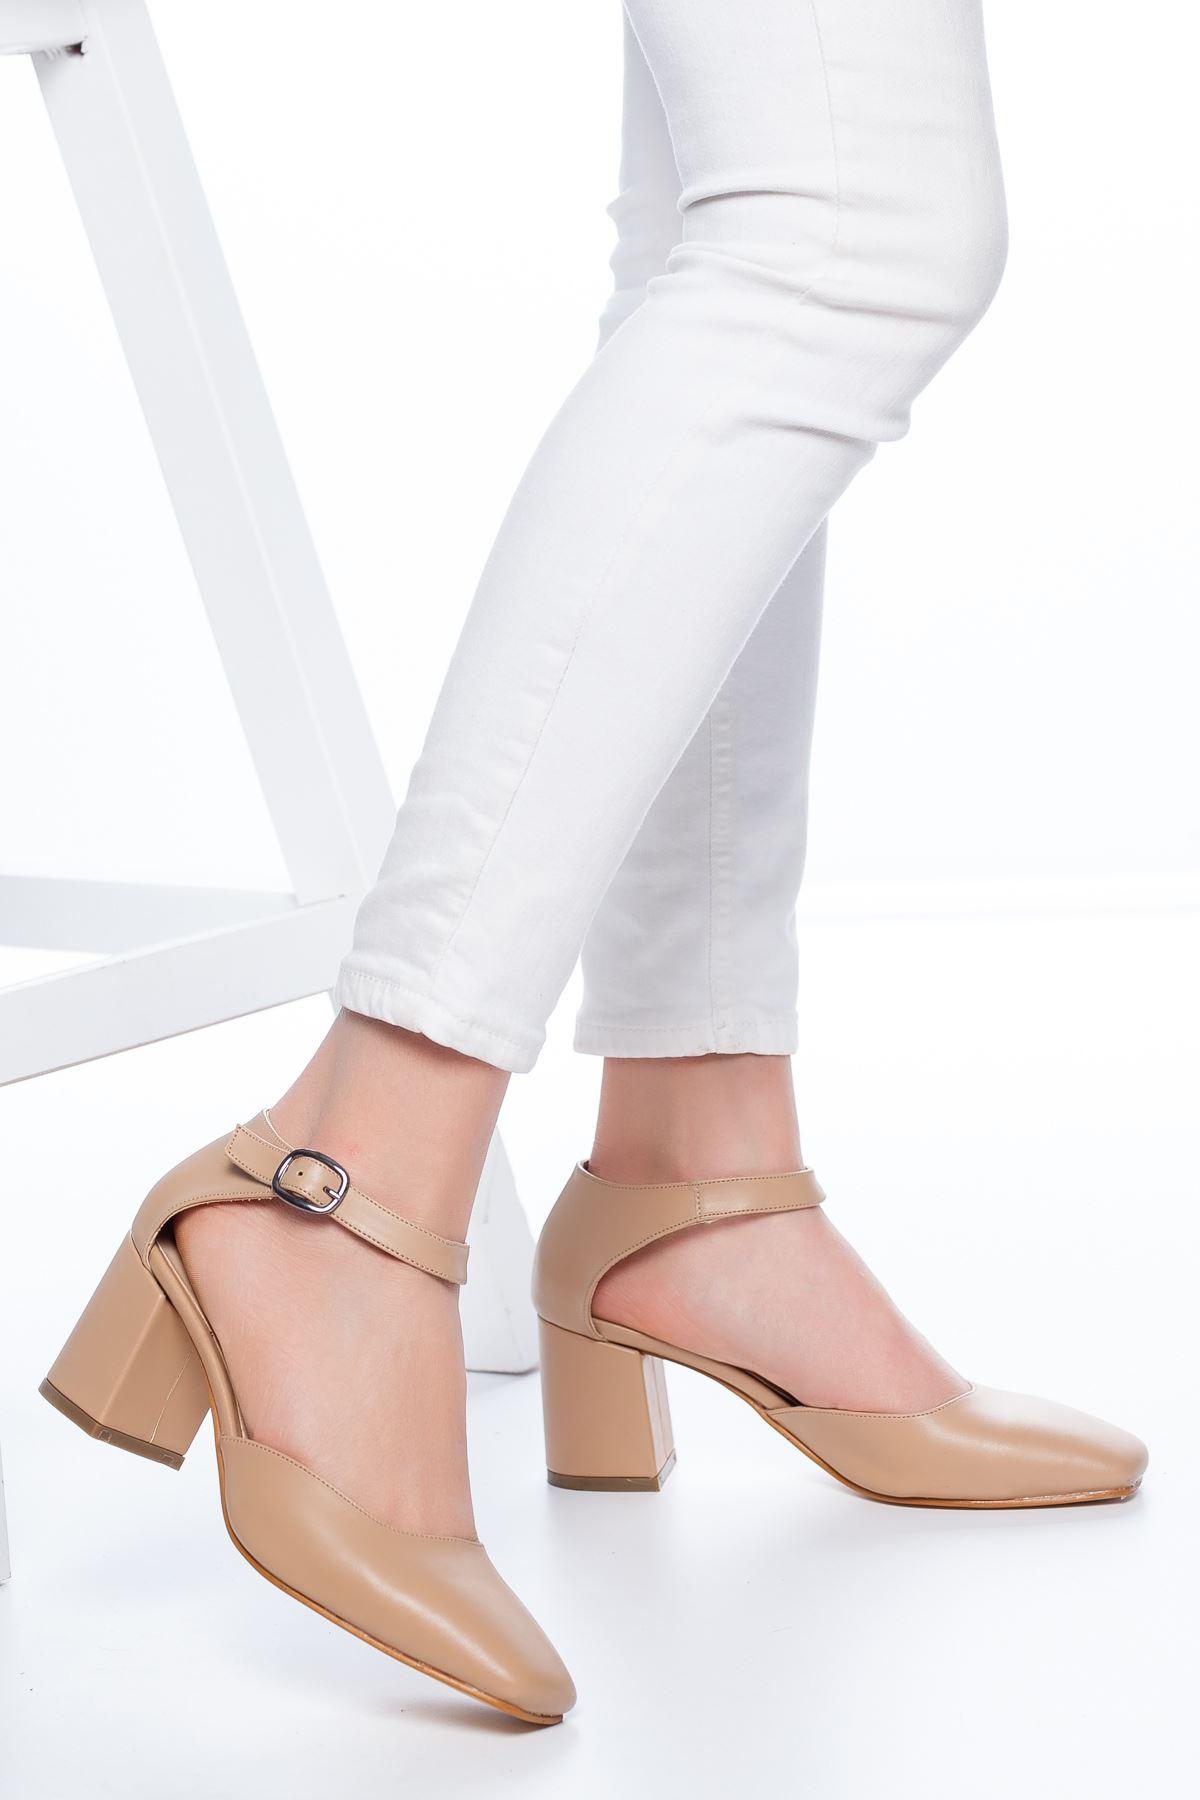 Dores Küt Burun Cilt Topuklu Ayakkabı Ten